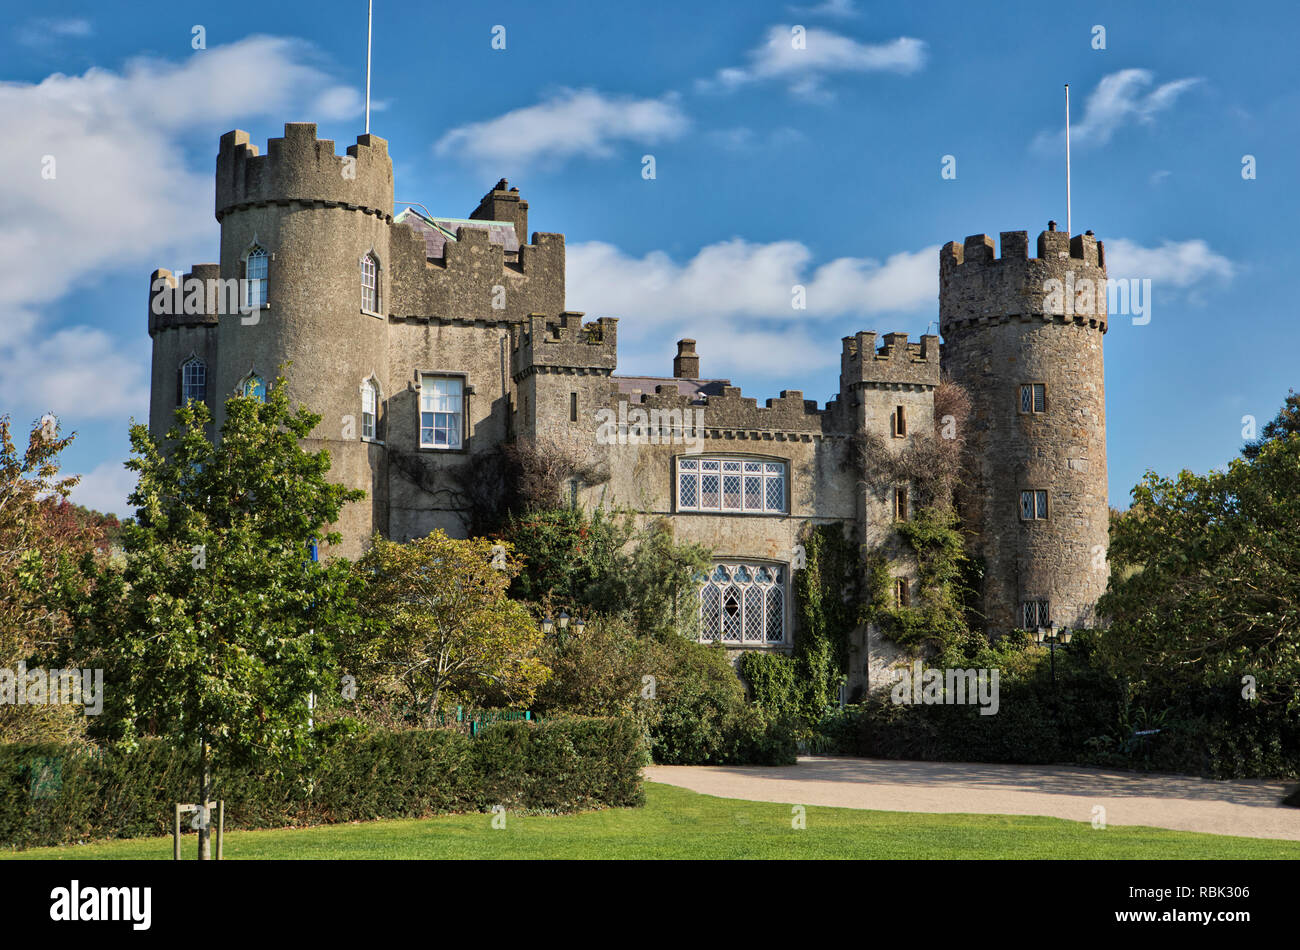 The Malahide Castle in Malahide, Ireland. - Stock Image